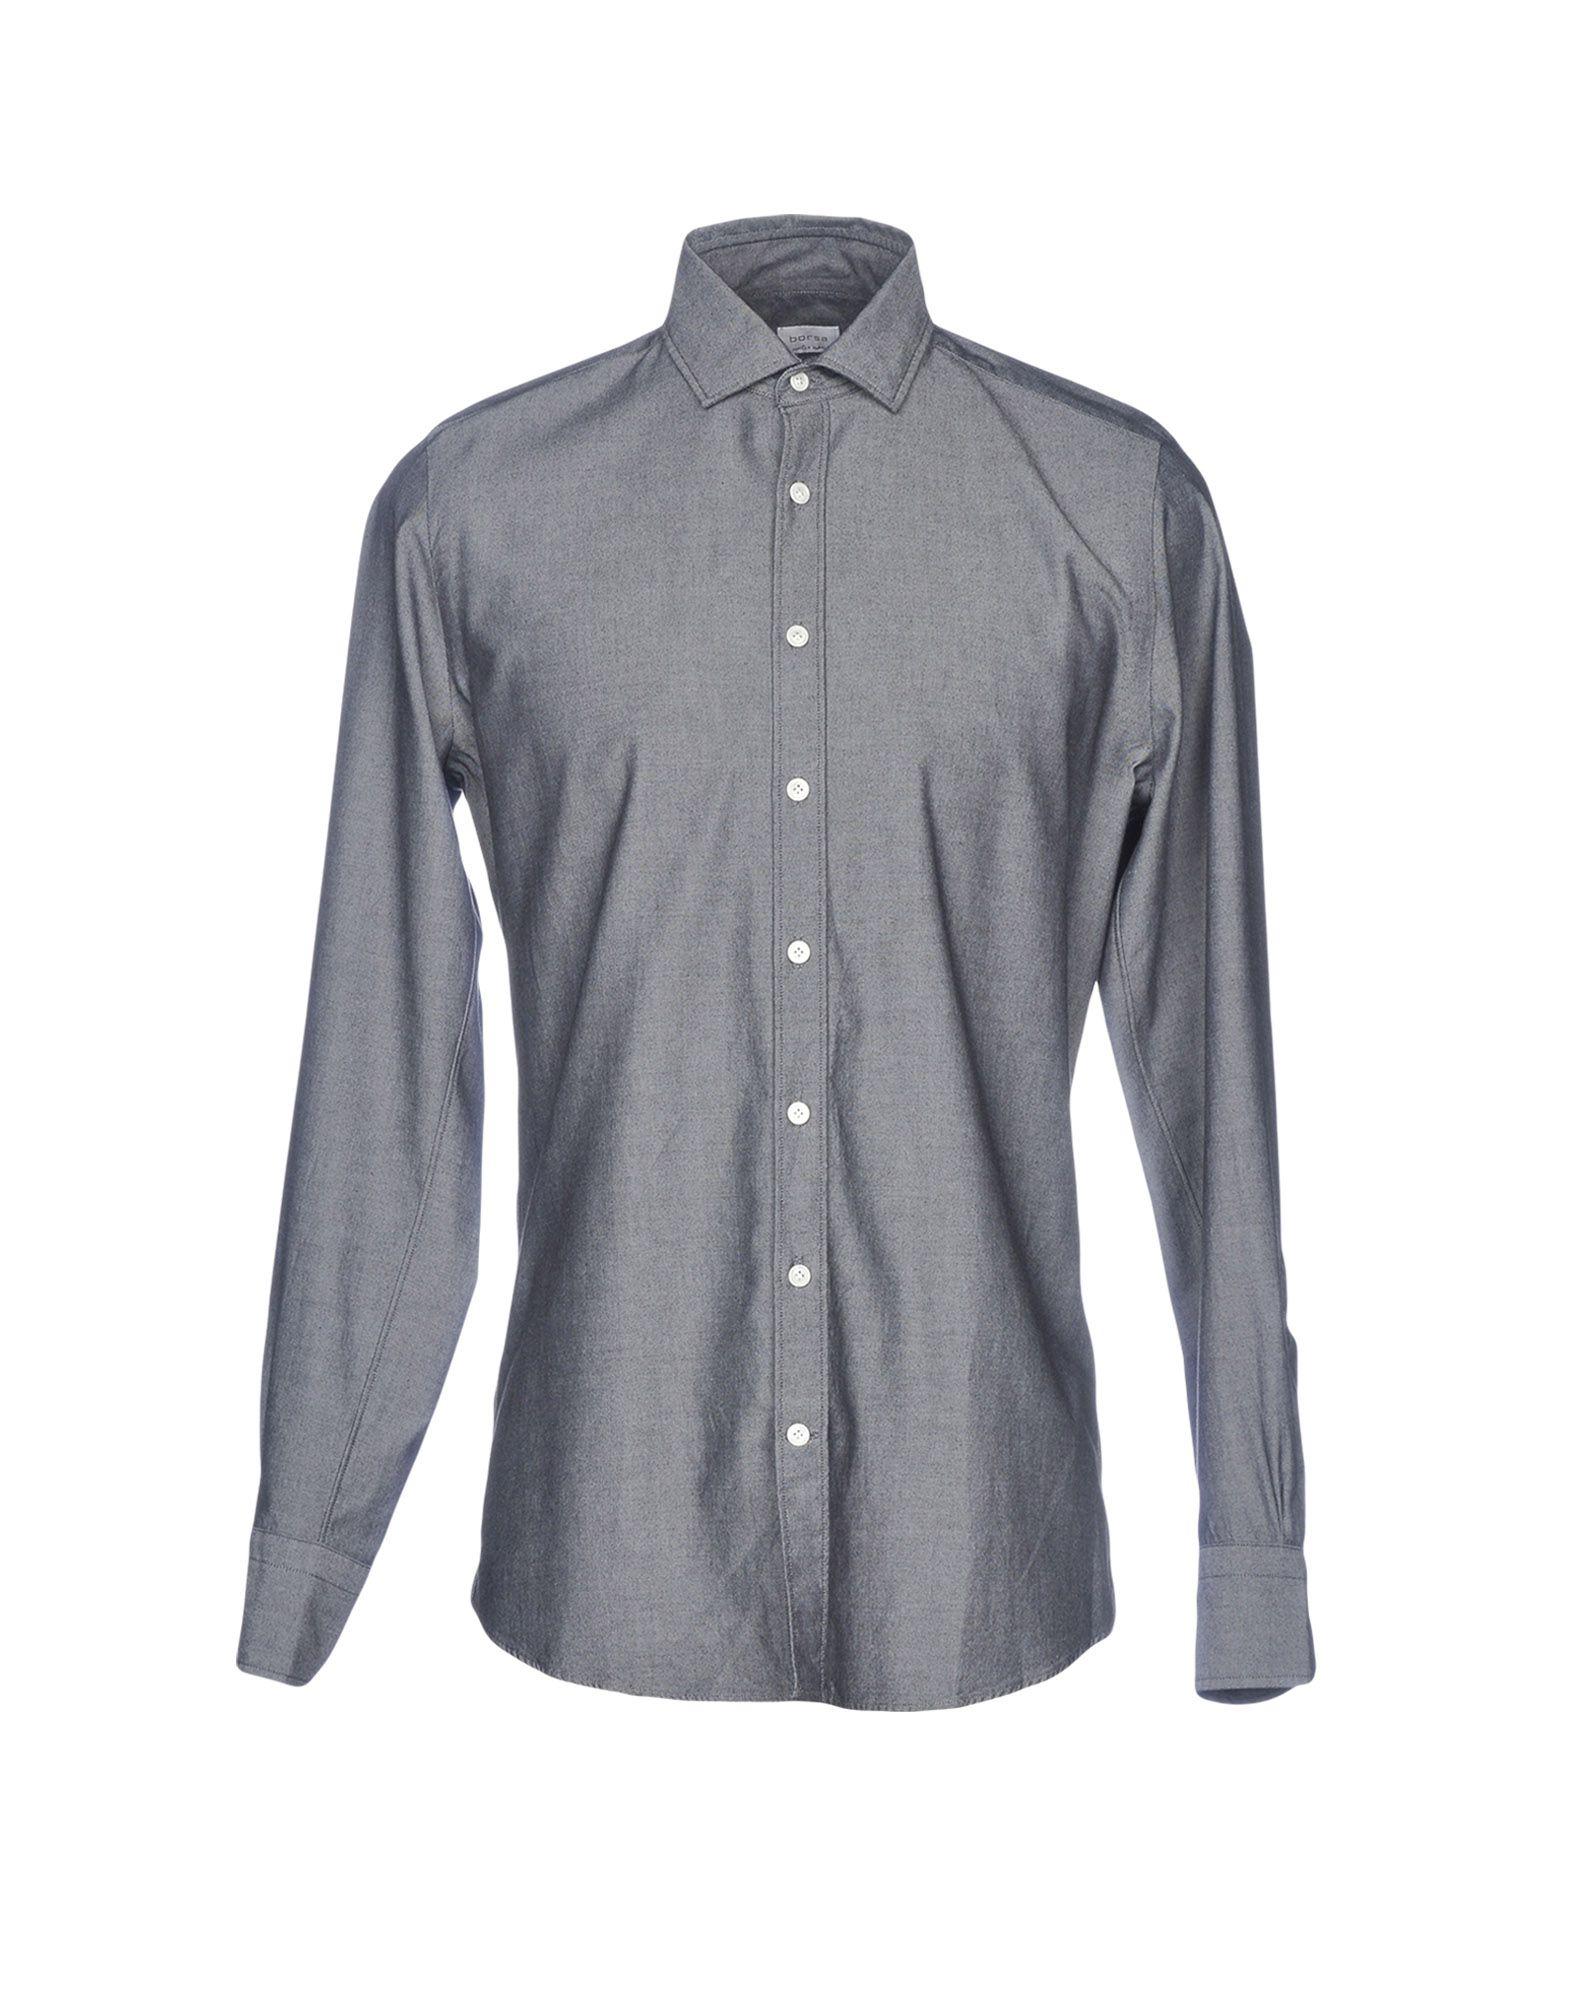 BORSA Solid Color Shirt in Steel Grey